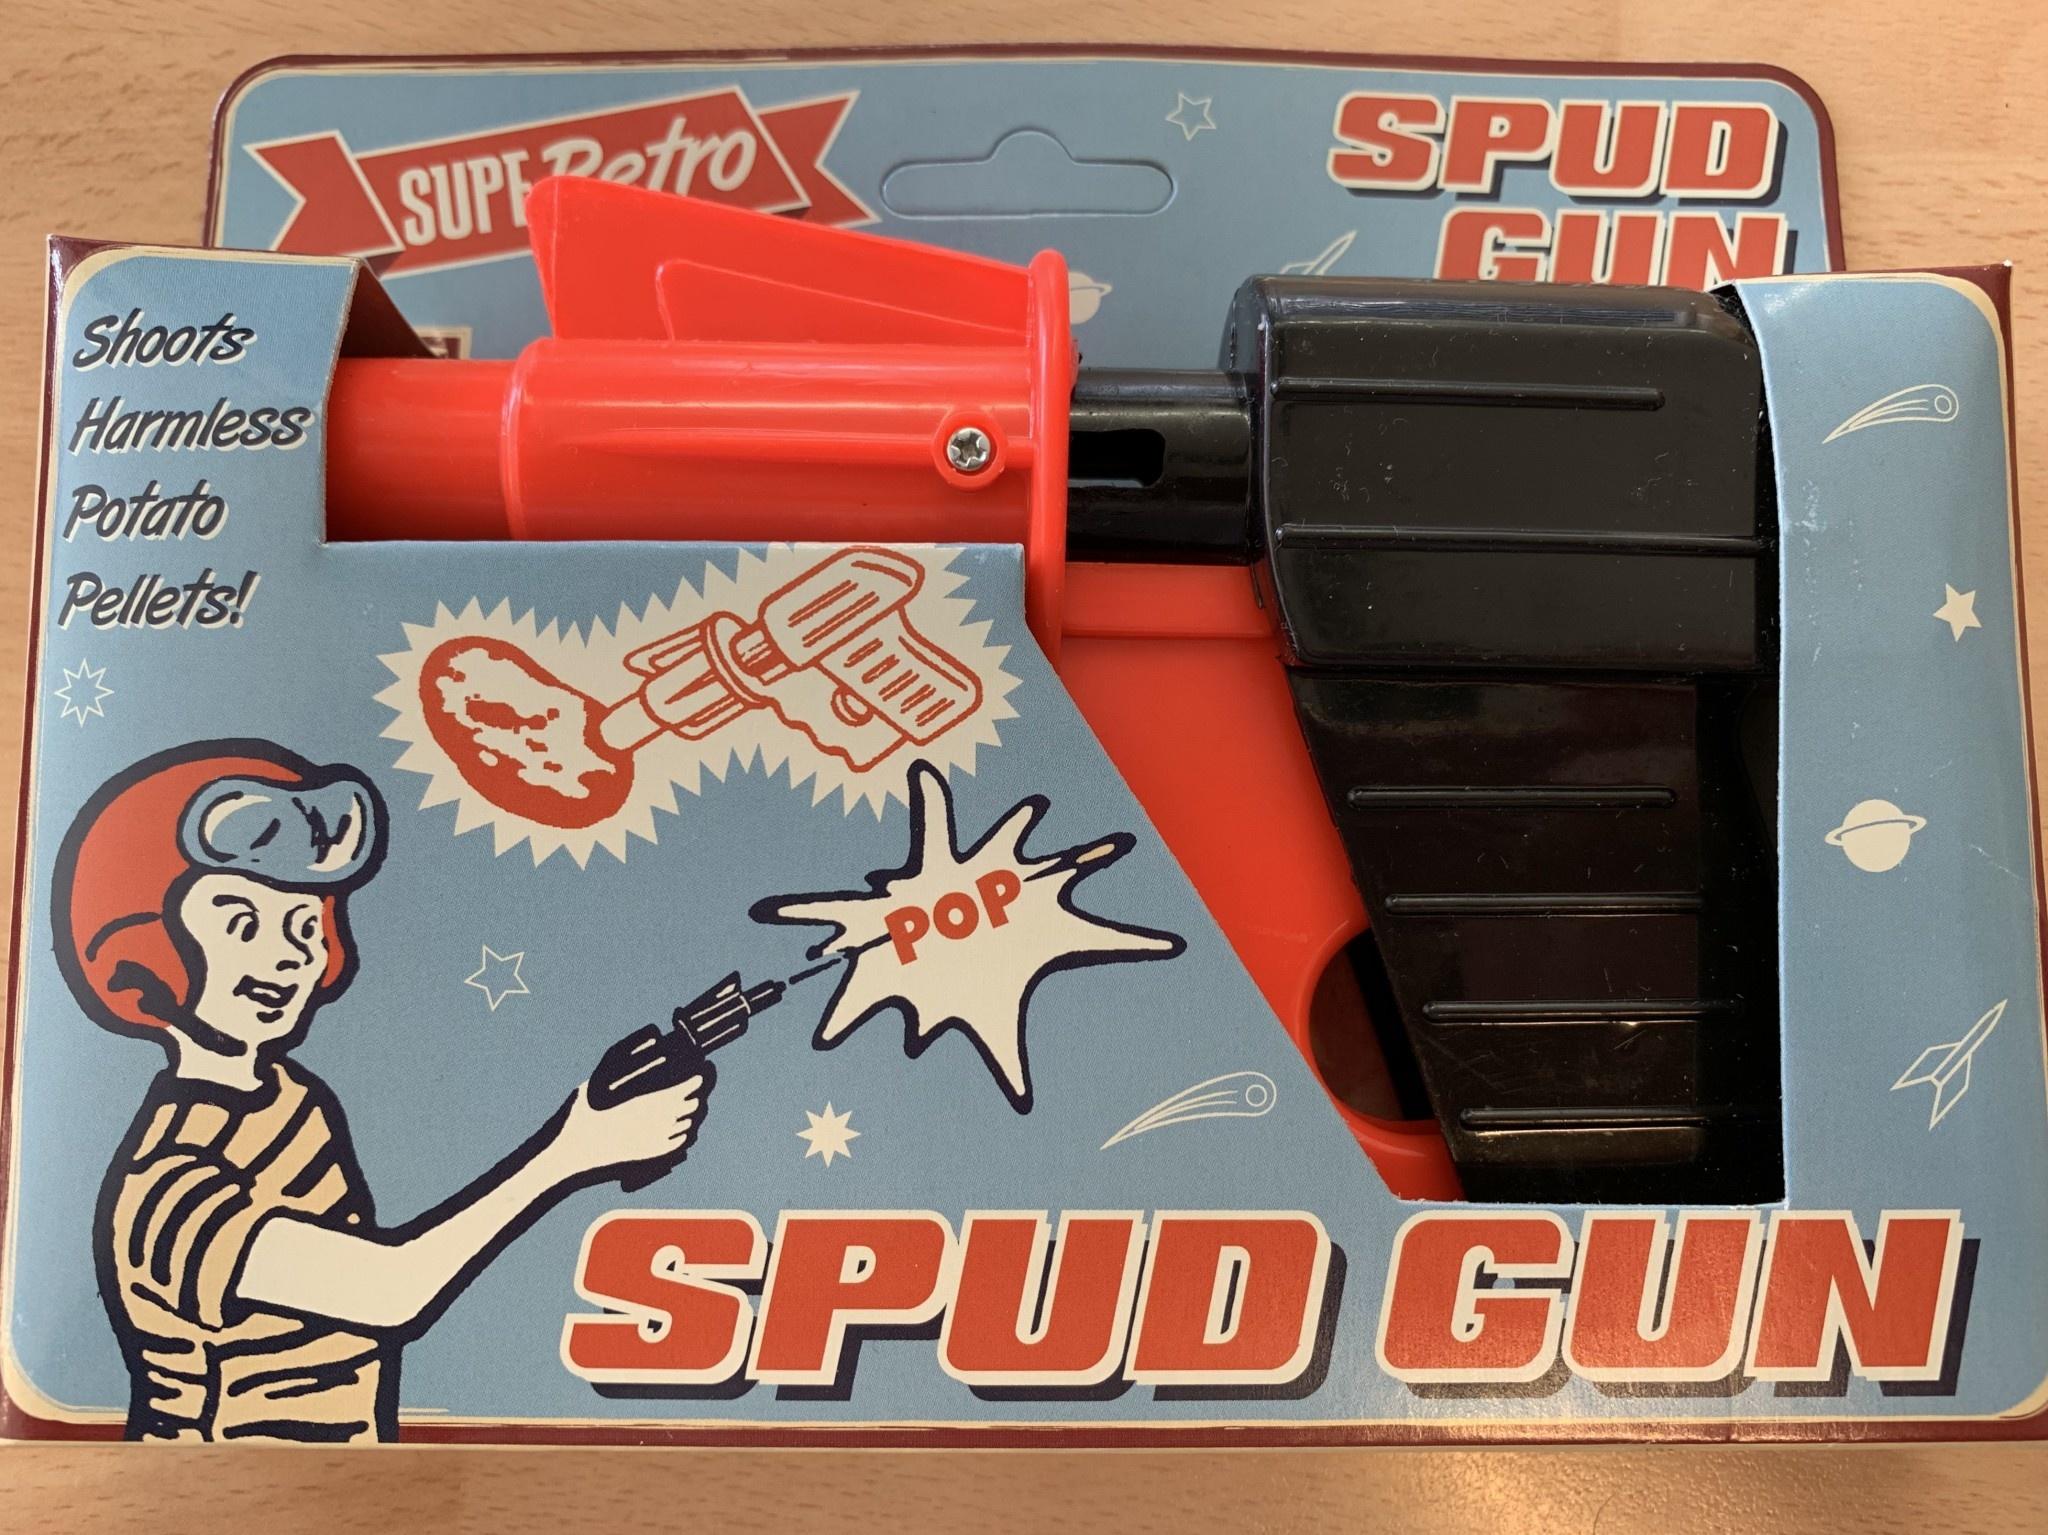 SupeRetro Toys Spud Gun